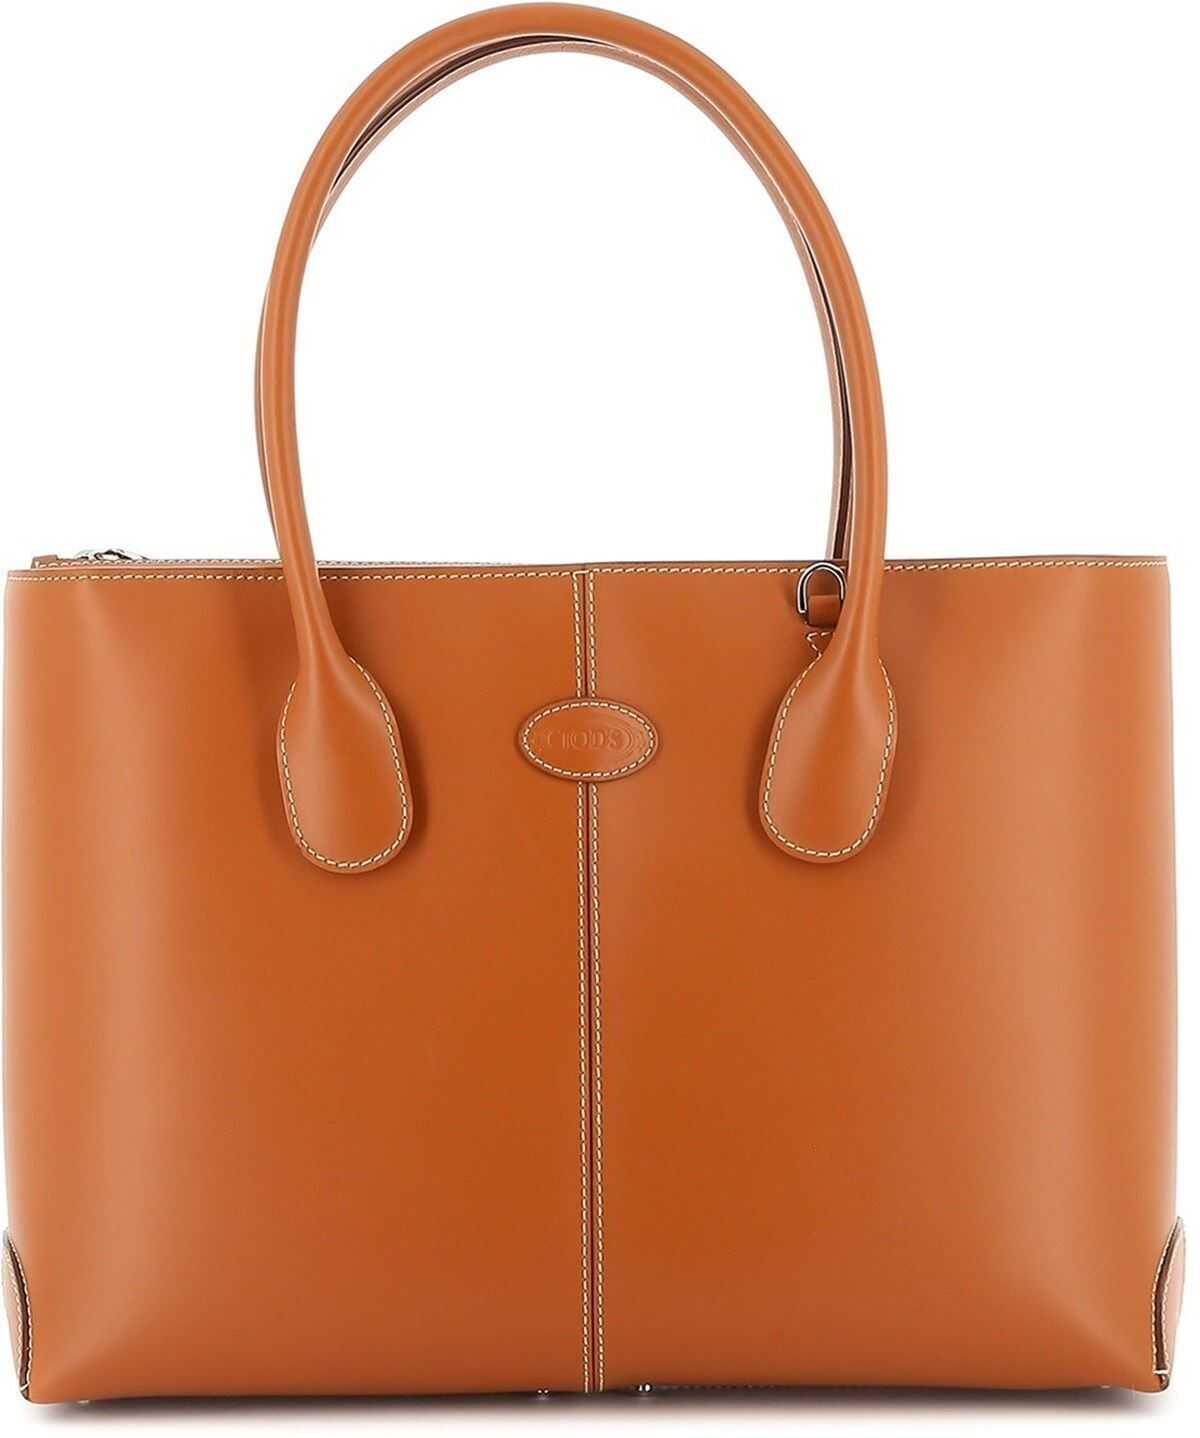 TOD'S D-Bag Medium Tote XBWDBAA0300RIIG807 Brown imagine b-mall.ro